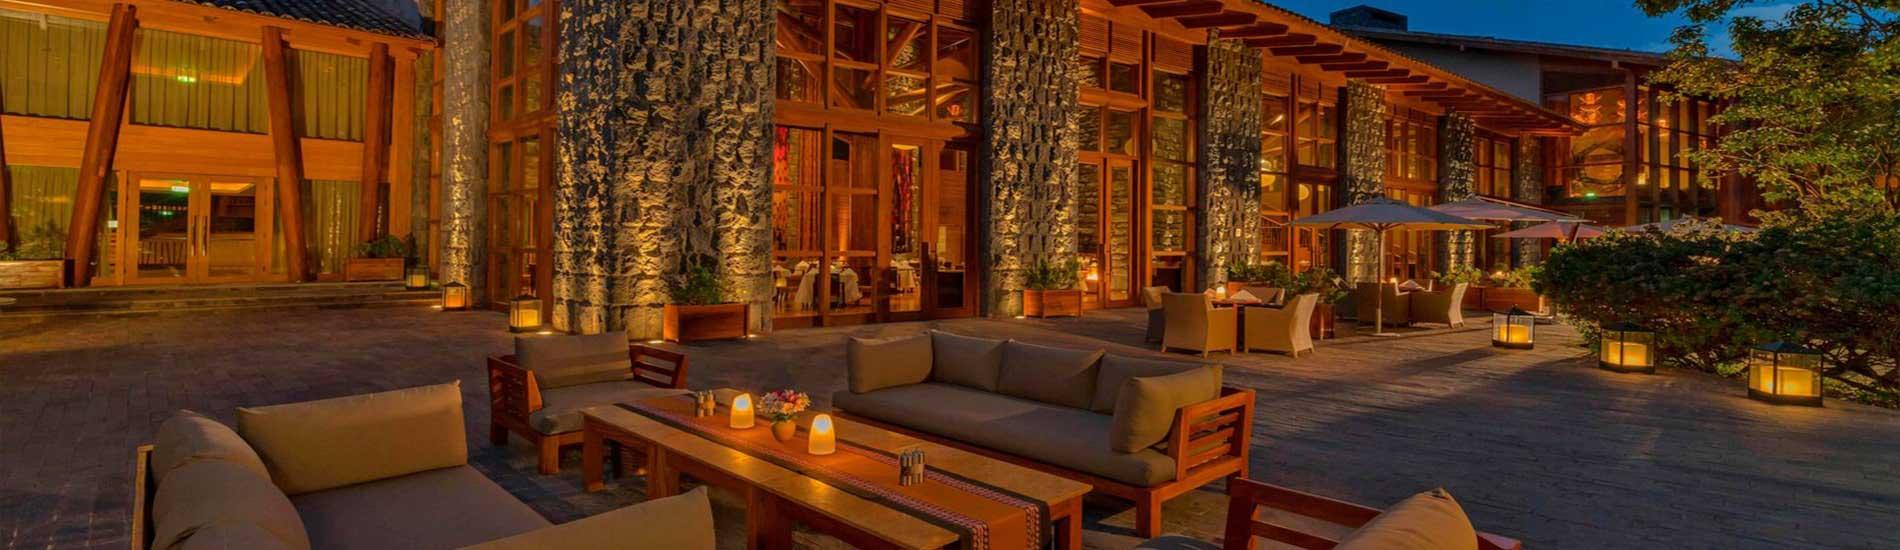 Tambo del Inka Hotel